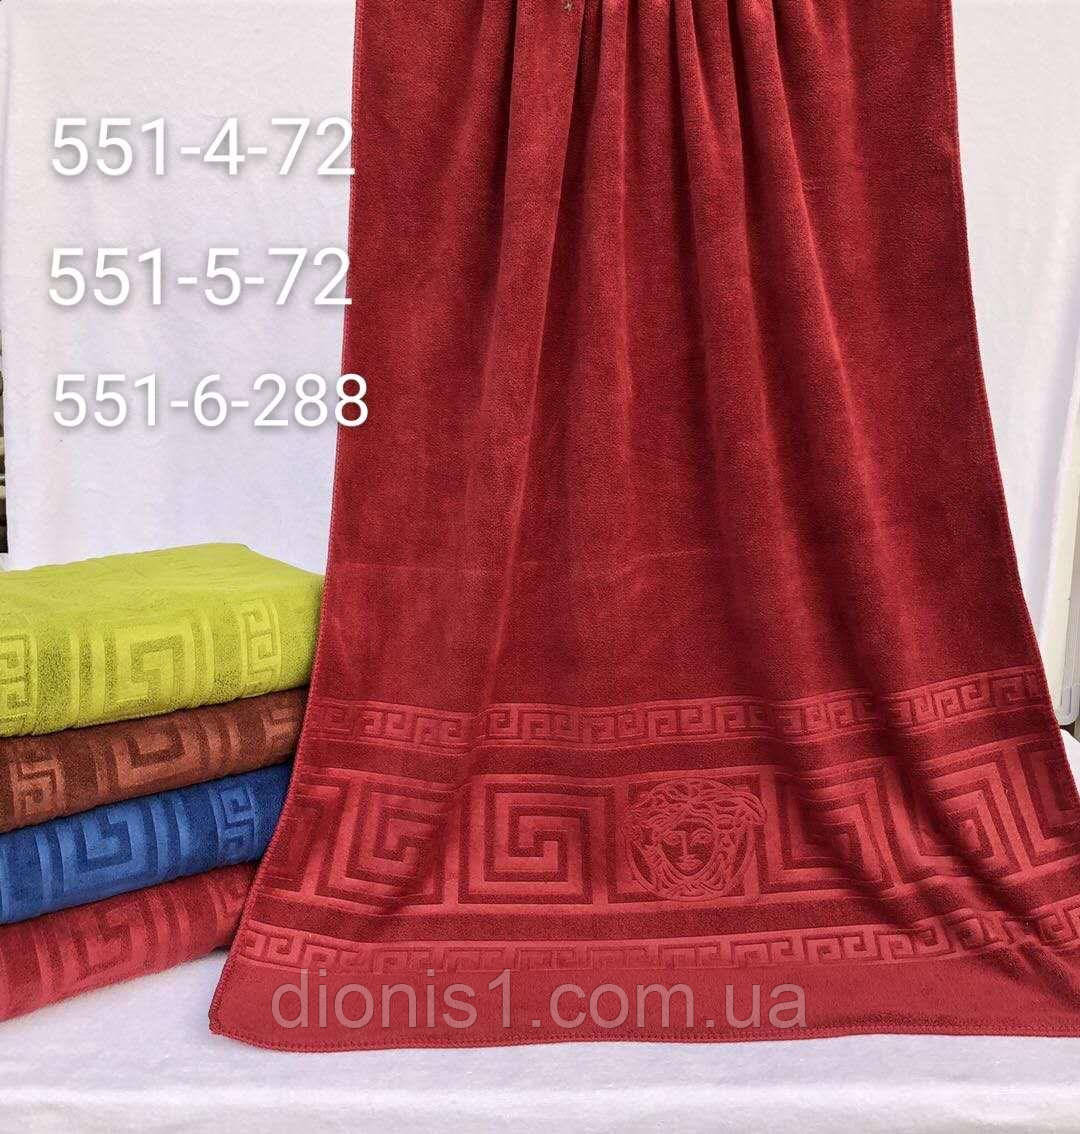 Банное полотенце версаче состав: фибра, размер 50х90 кол-во 8 шт